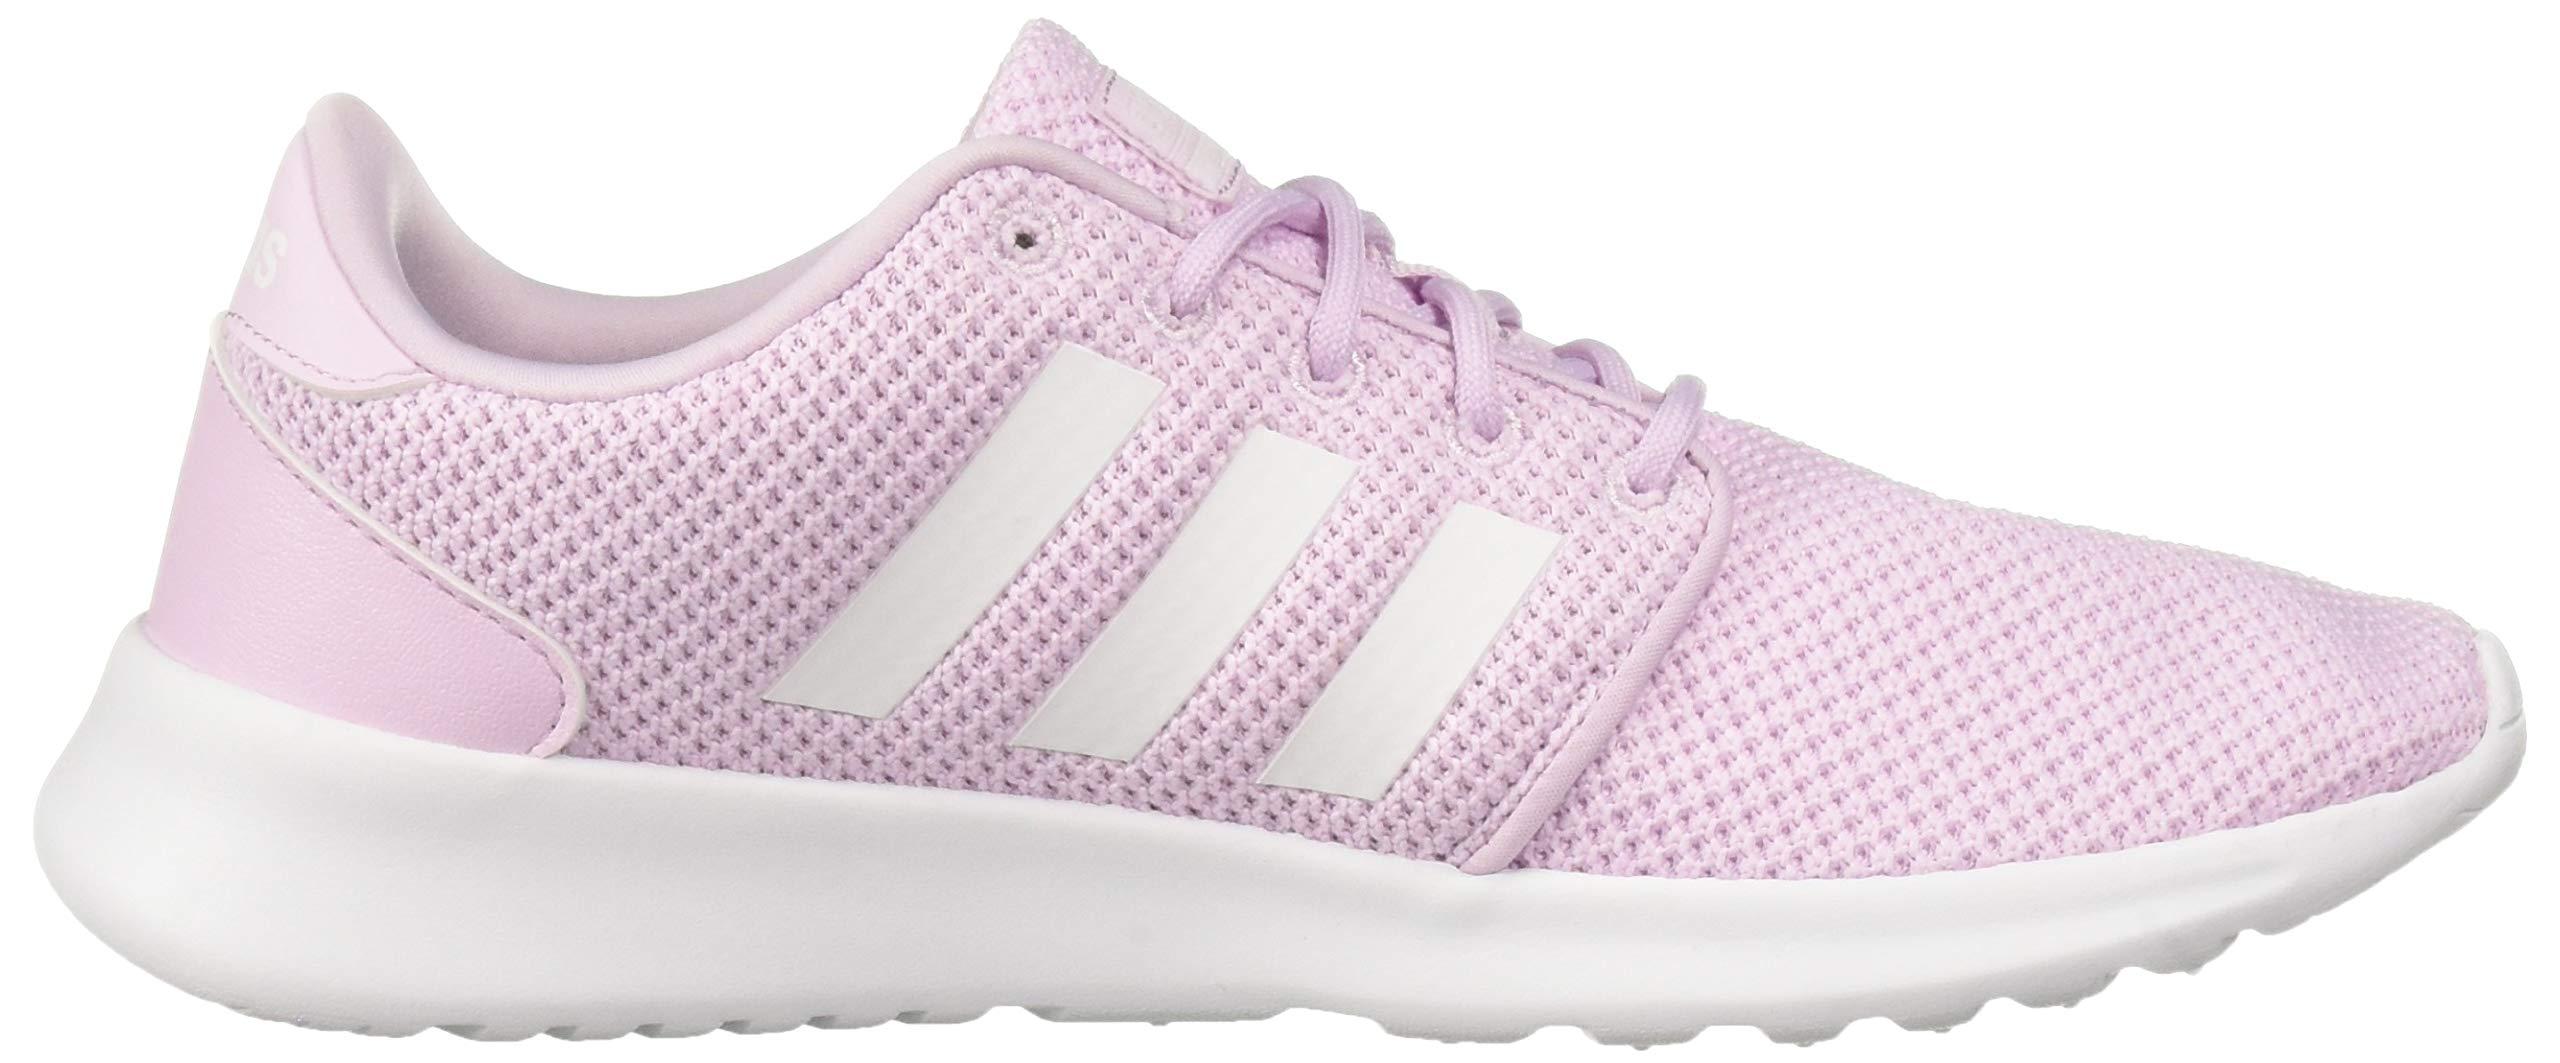 adidas Women's Cloudfoam QT Racer, White/aero Pink, 5.5 M US by adidas (Image #6)